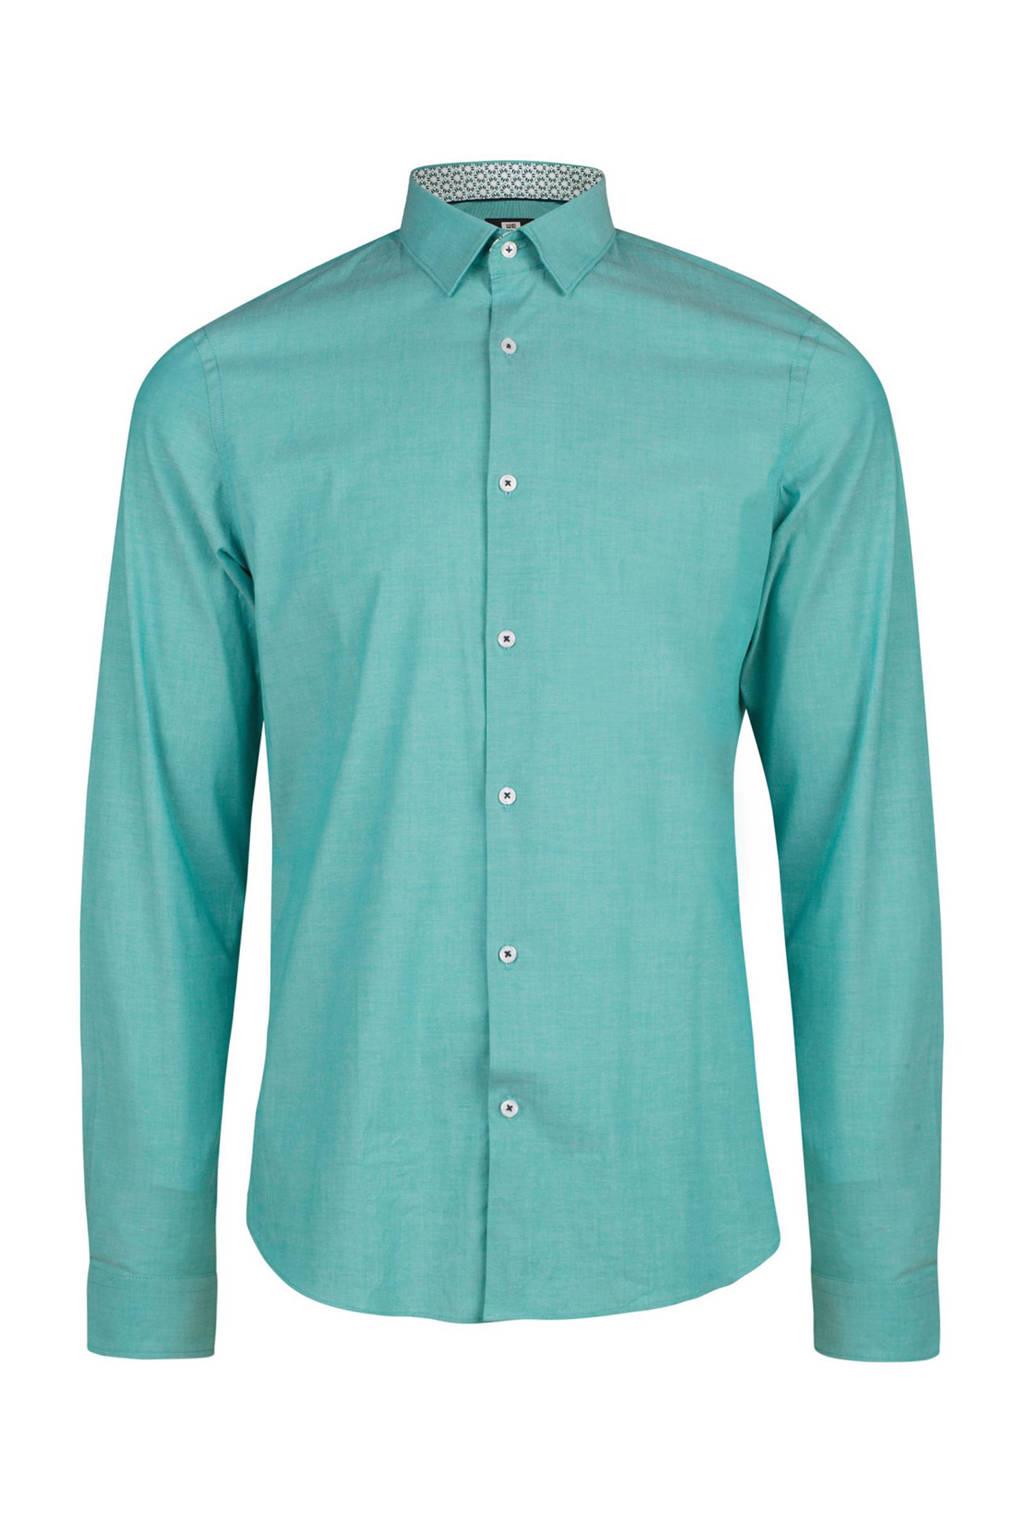 Mintgroen Heren Overhemd.We Fashion Slim Fit Overhemd Wehkamp